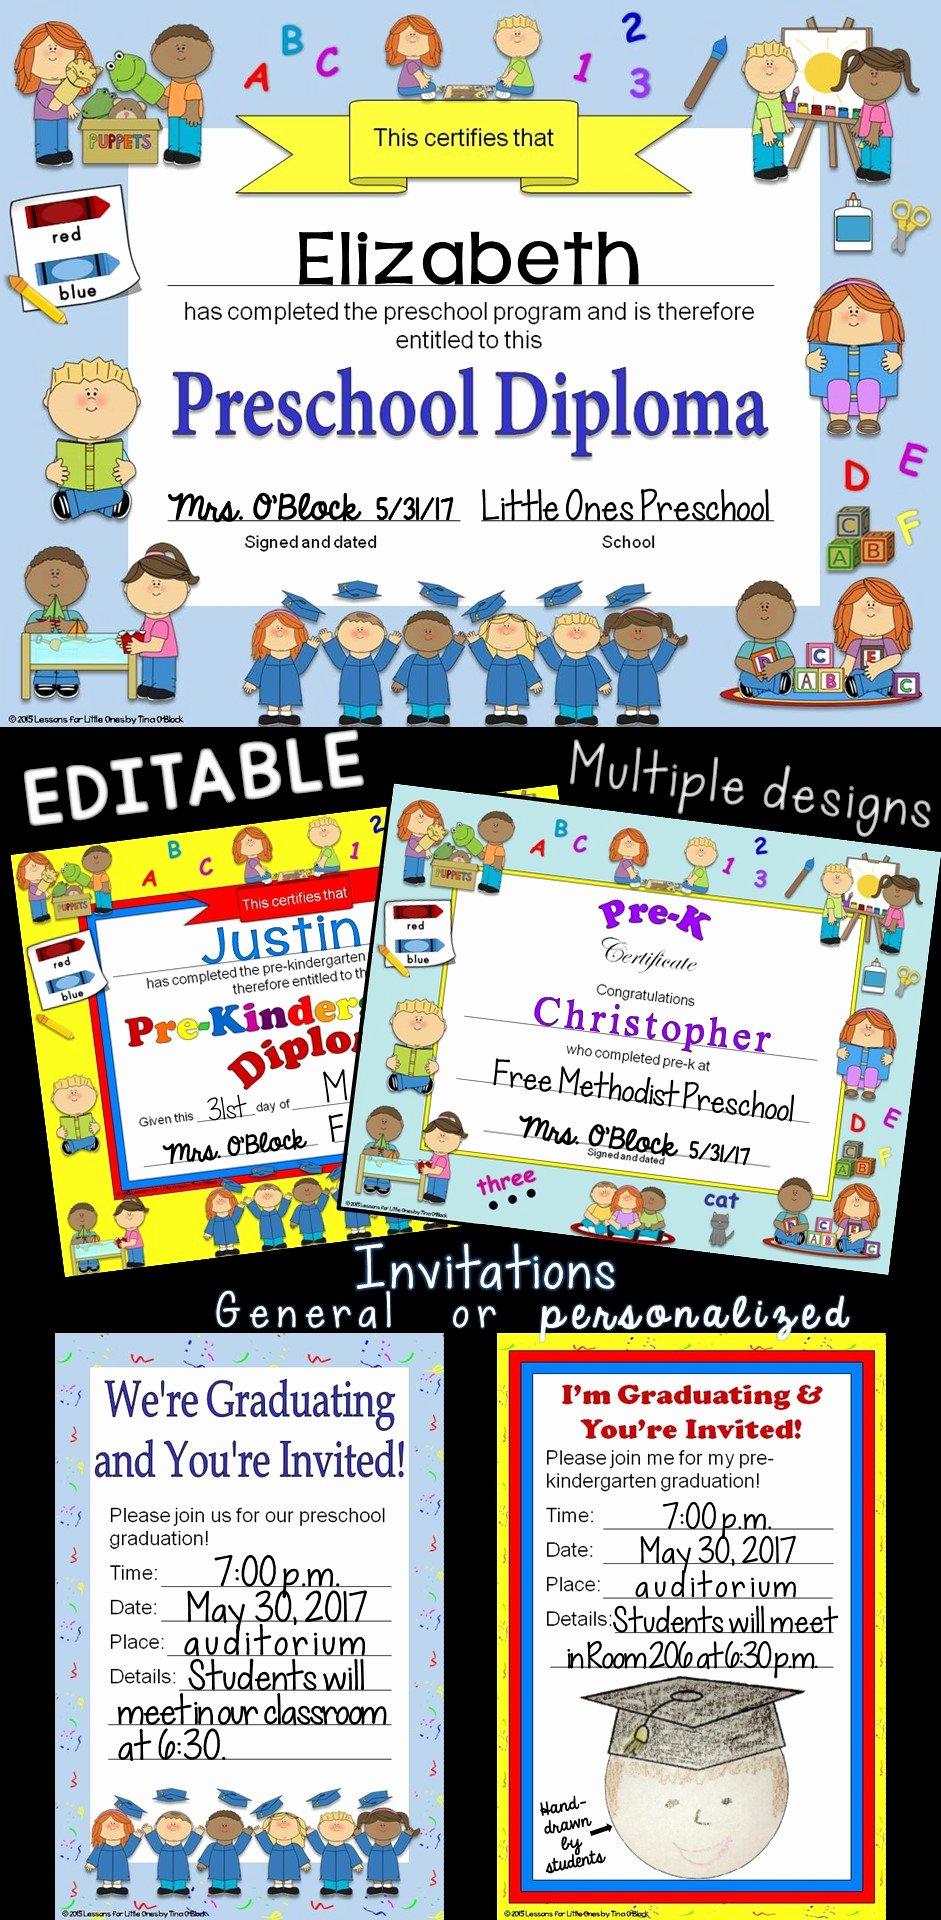 Preschool Graduation Certificate Editable Elegant Preschool Pre K Pre Kindergarten Diplomas Certificates